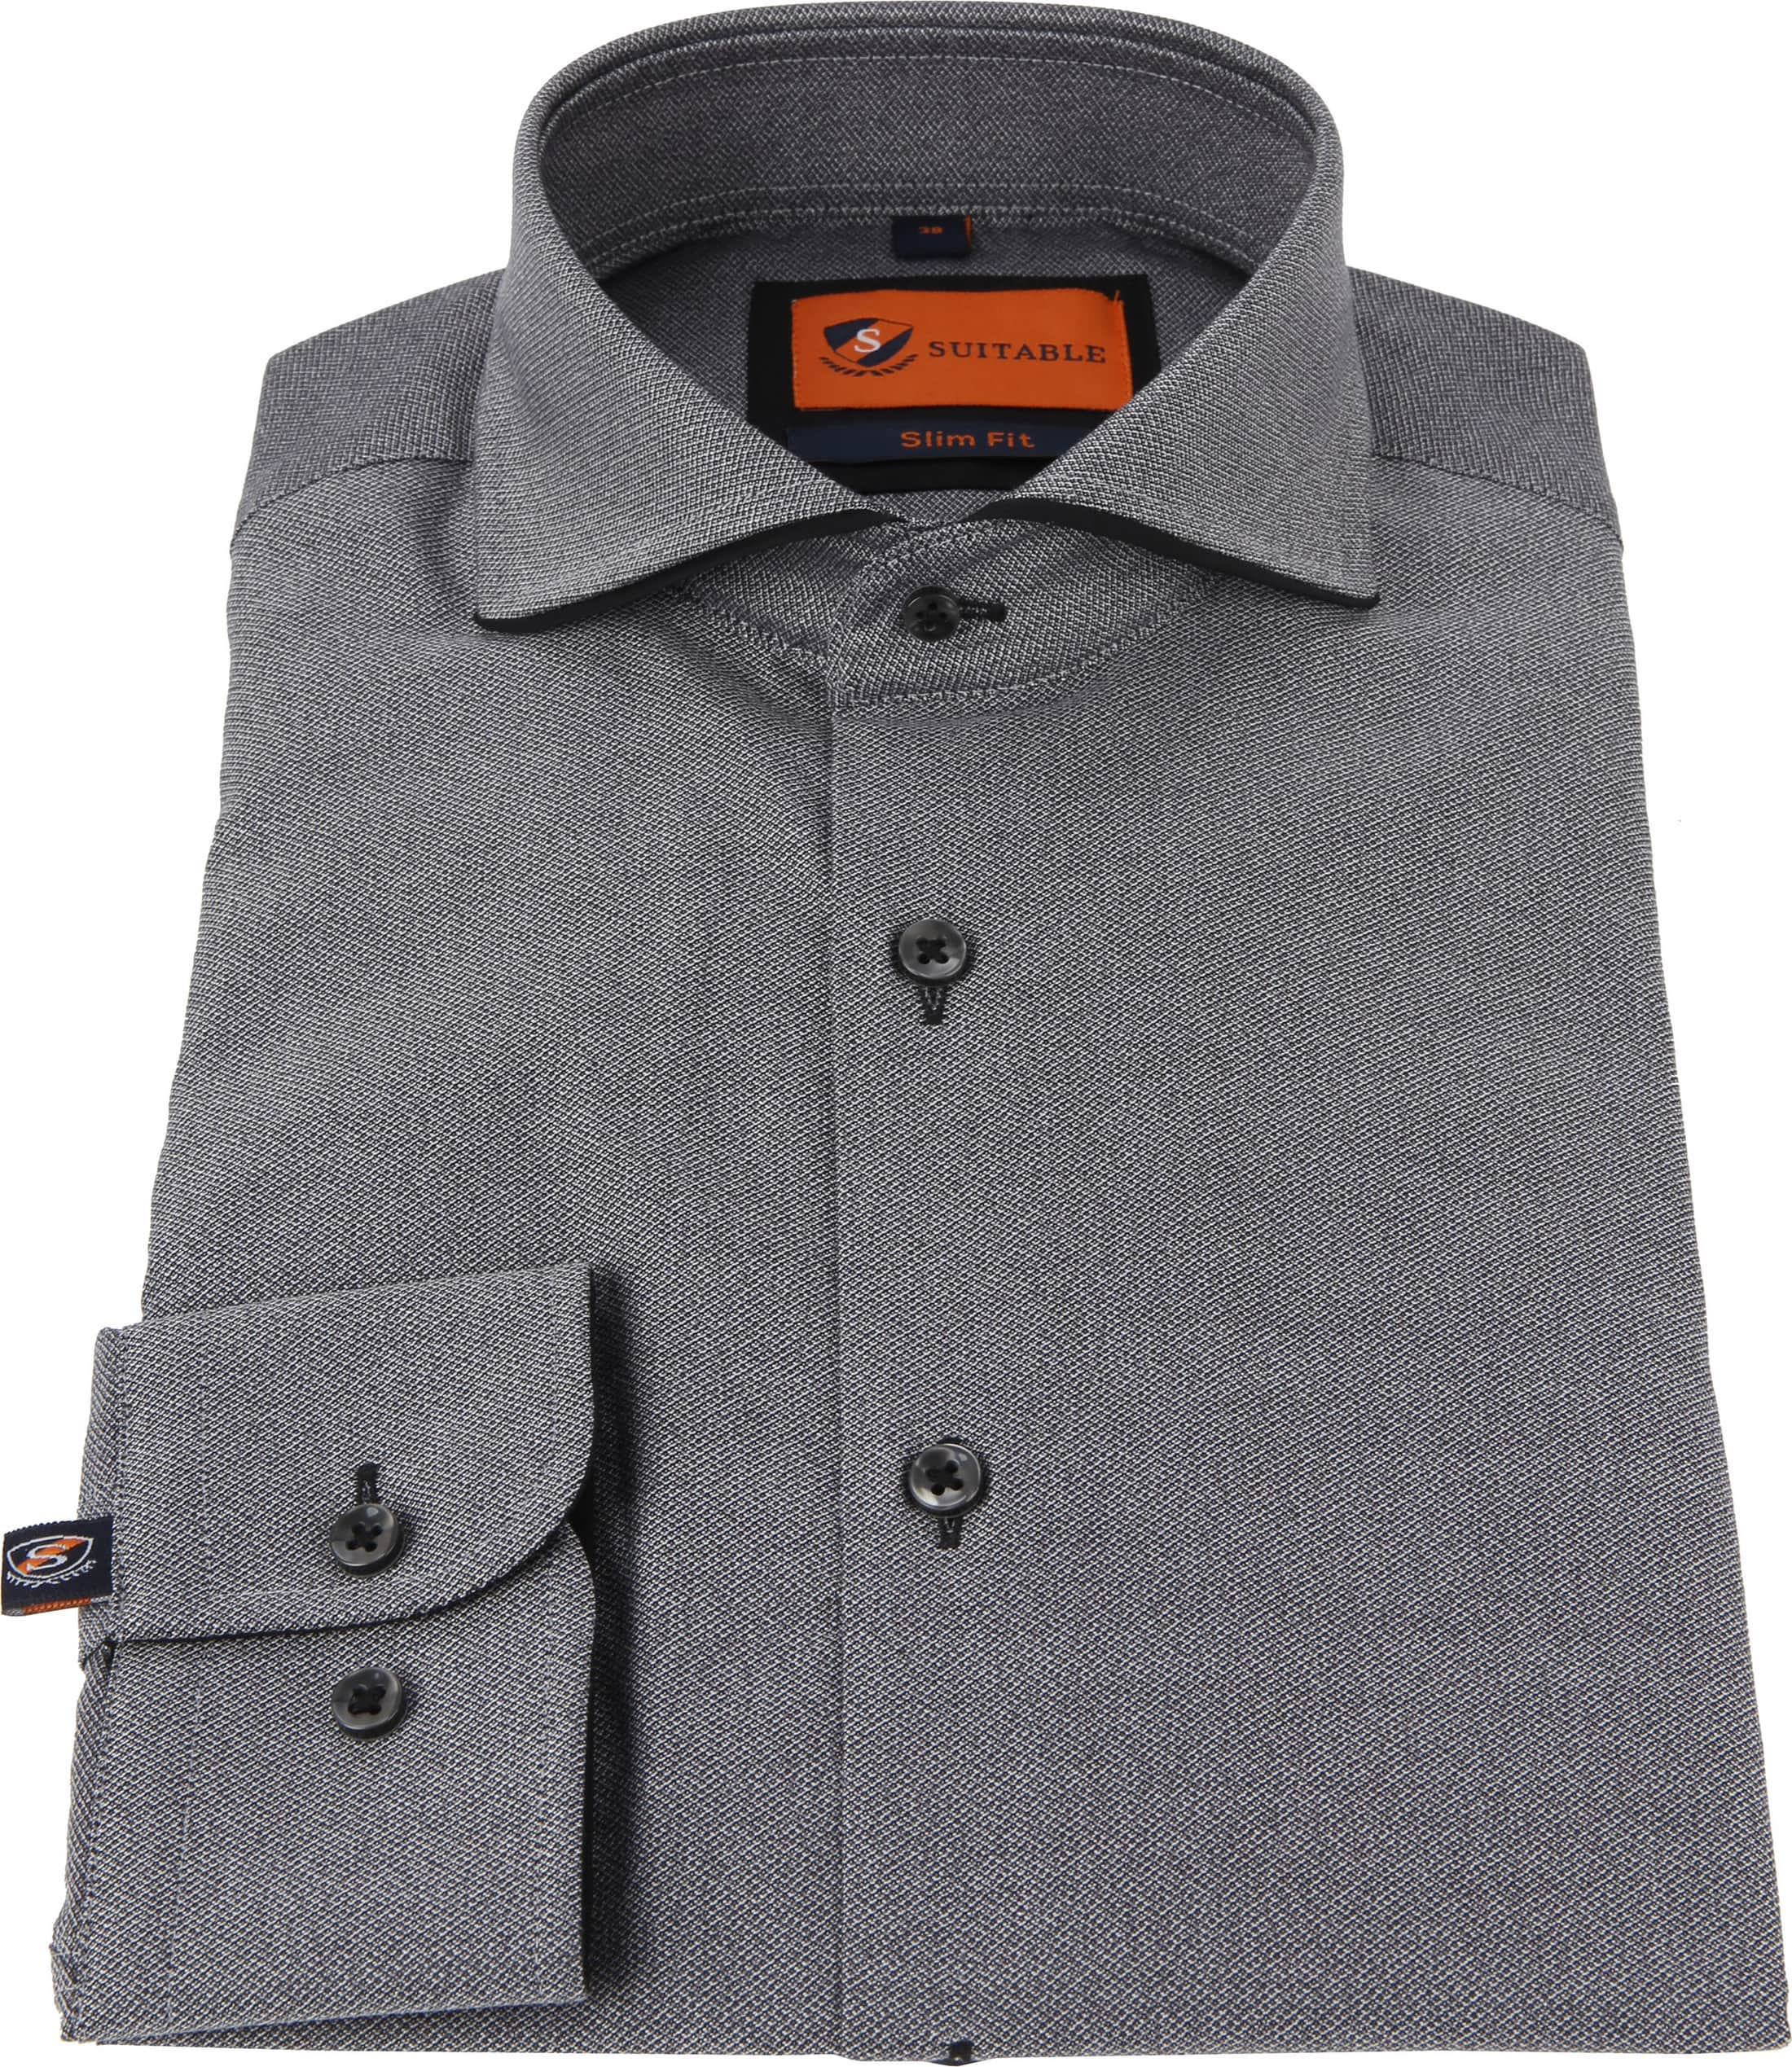 Suitable Overhemd Mouline Grijs foto 2